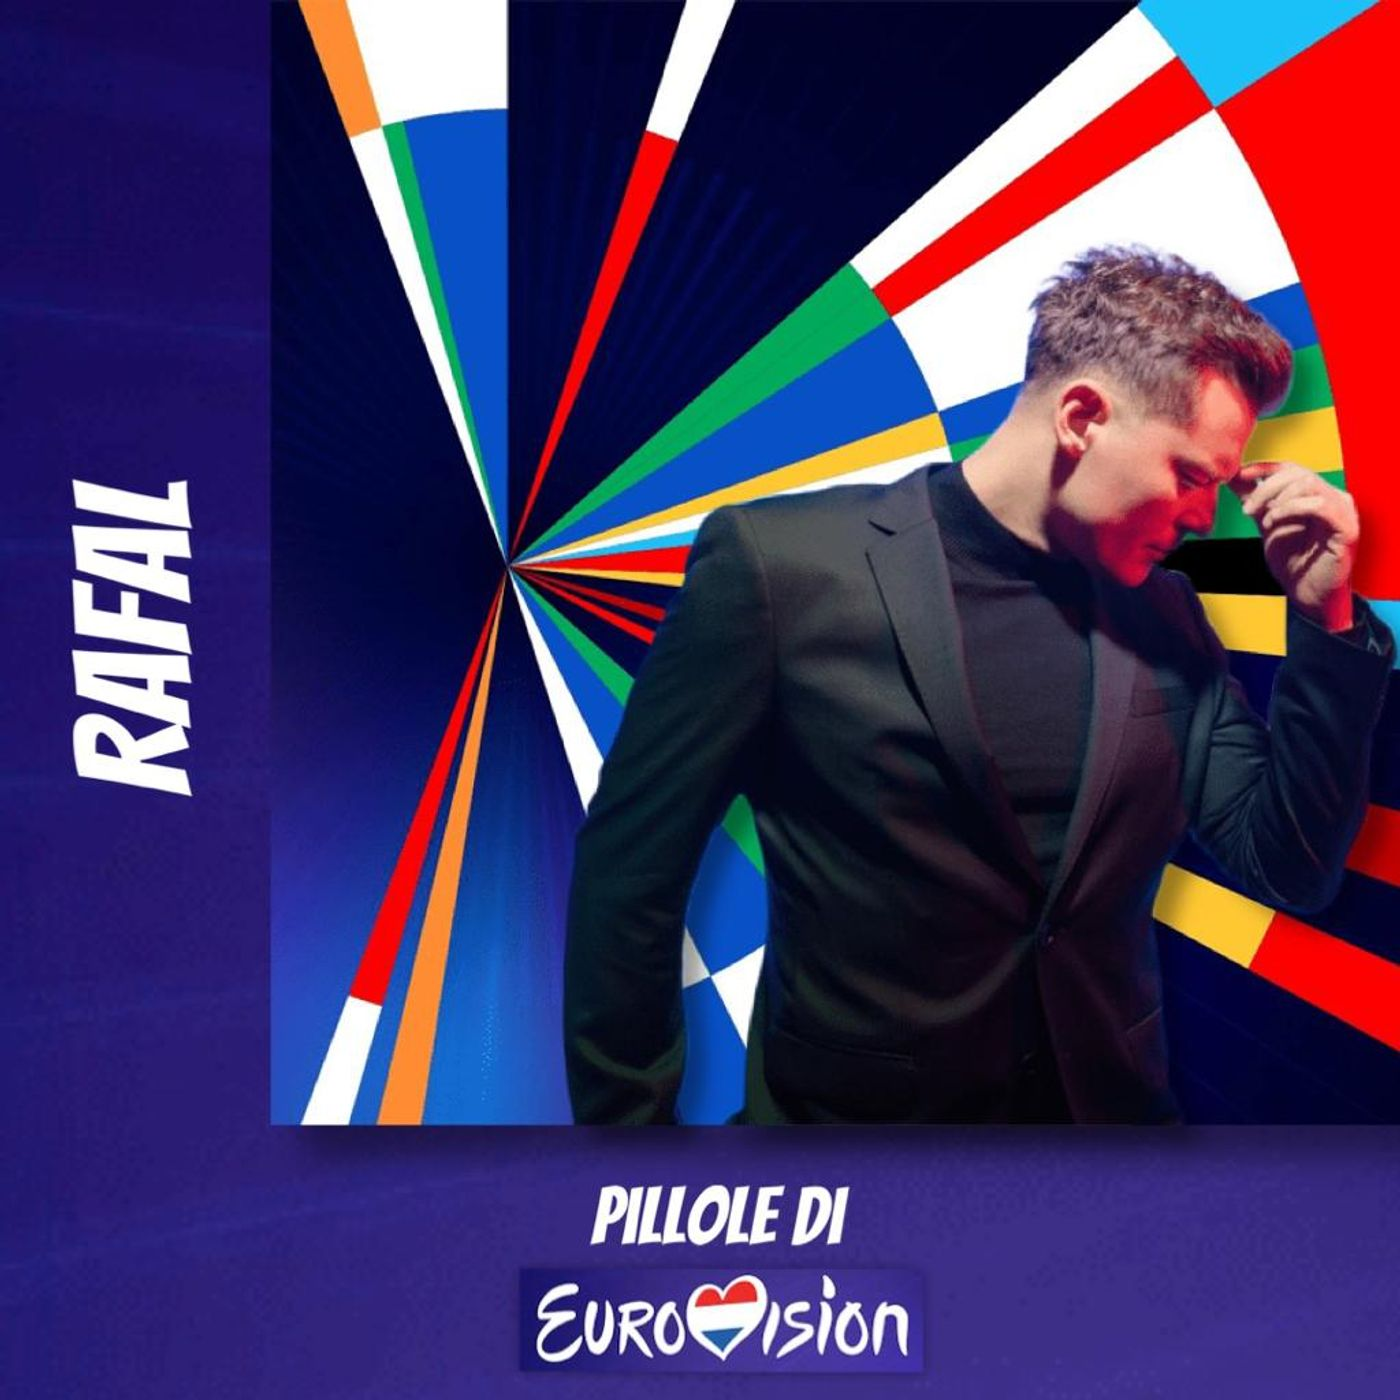 Pillole di Eurovision: Ep. 25 Rafal